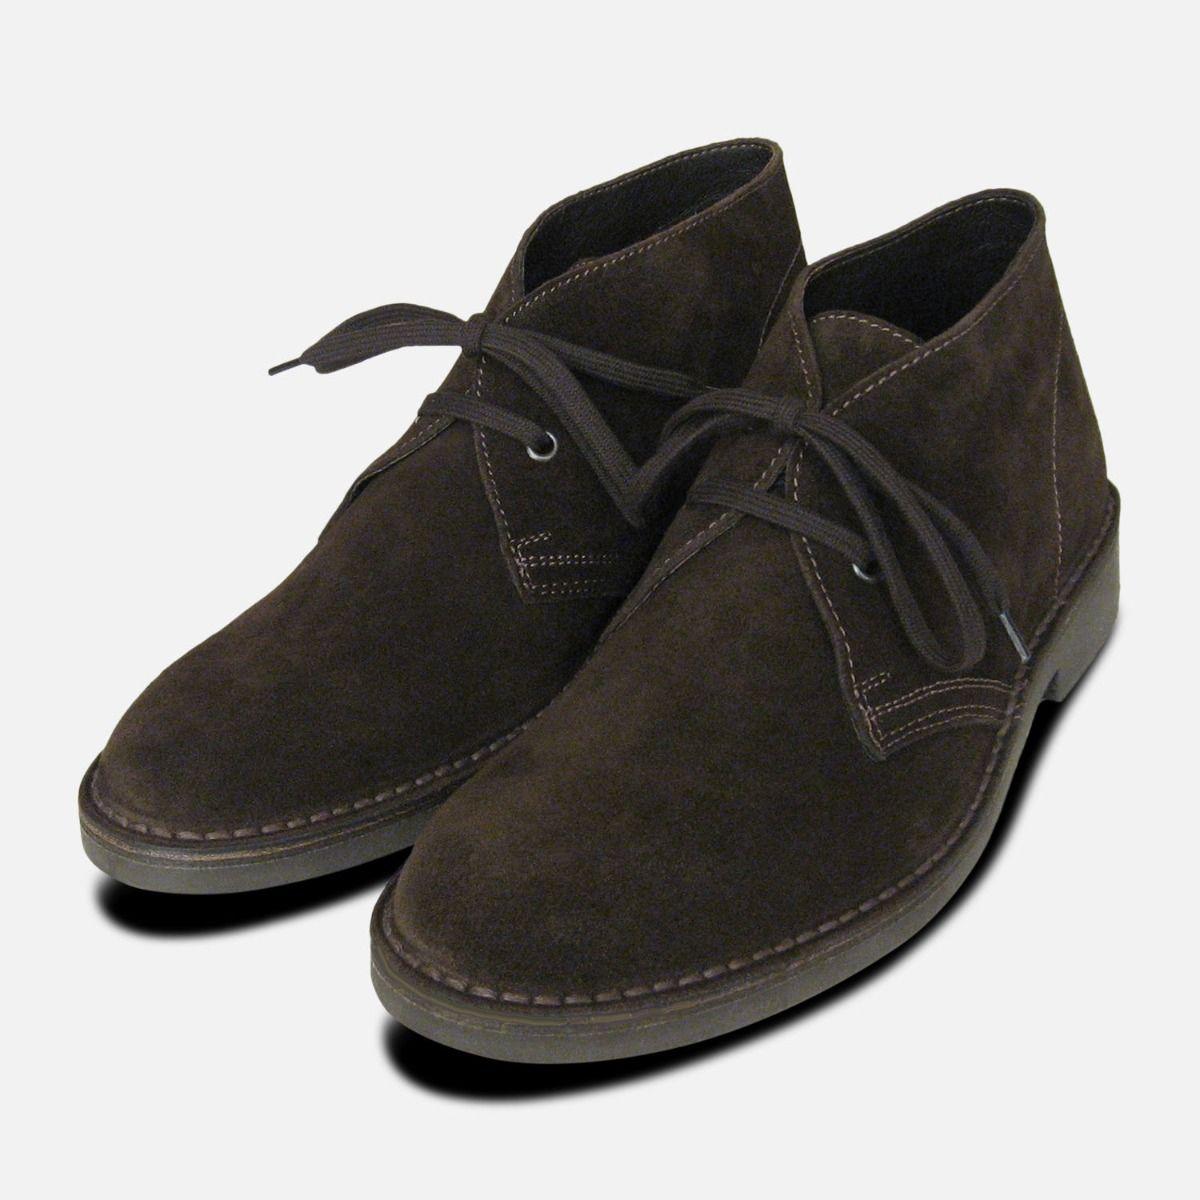 8d16ec085d6 Mens Dark Brown Suede Italian Desert Boot